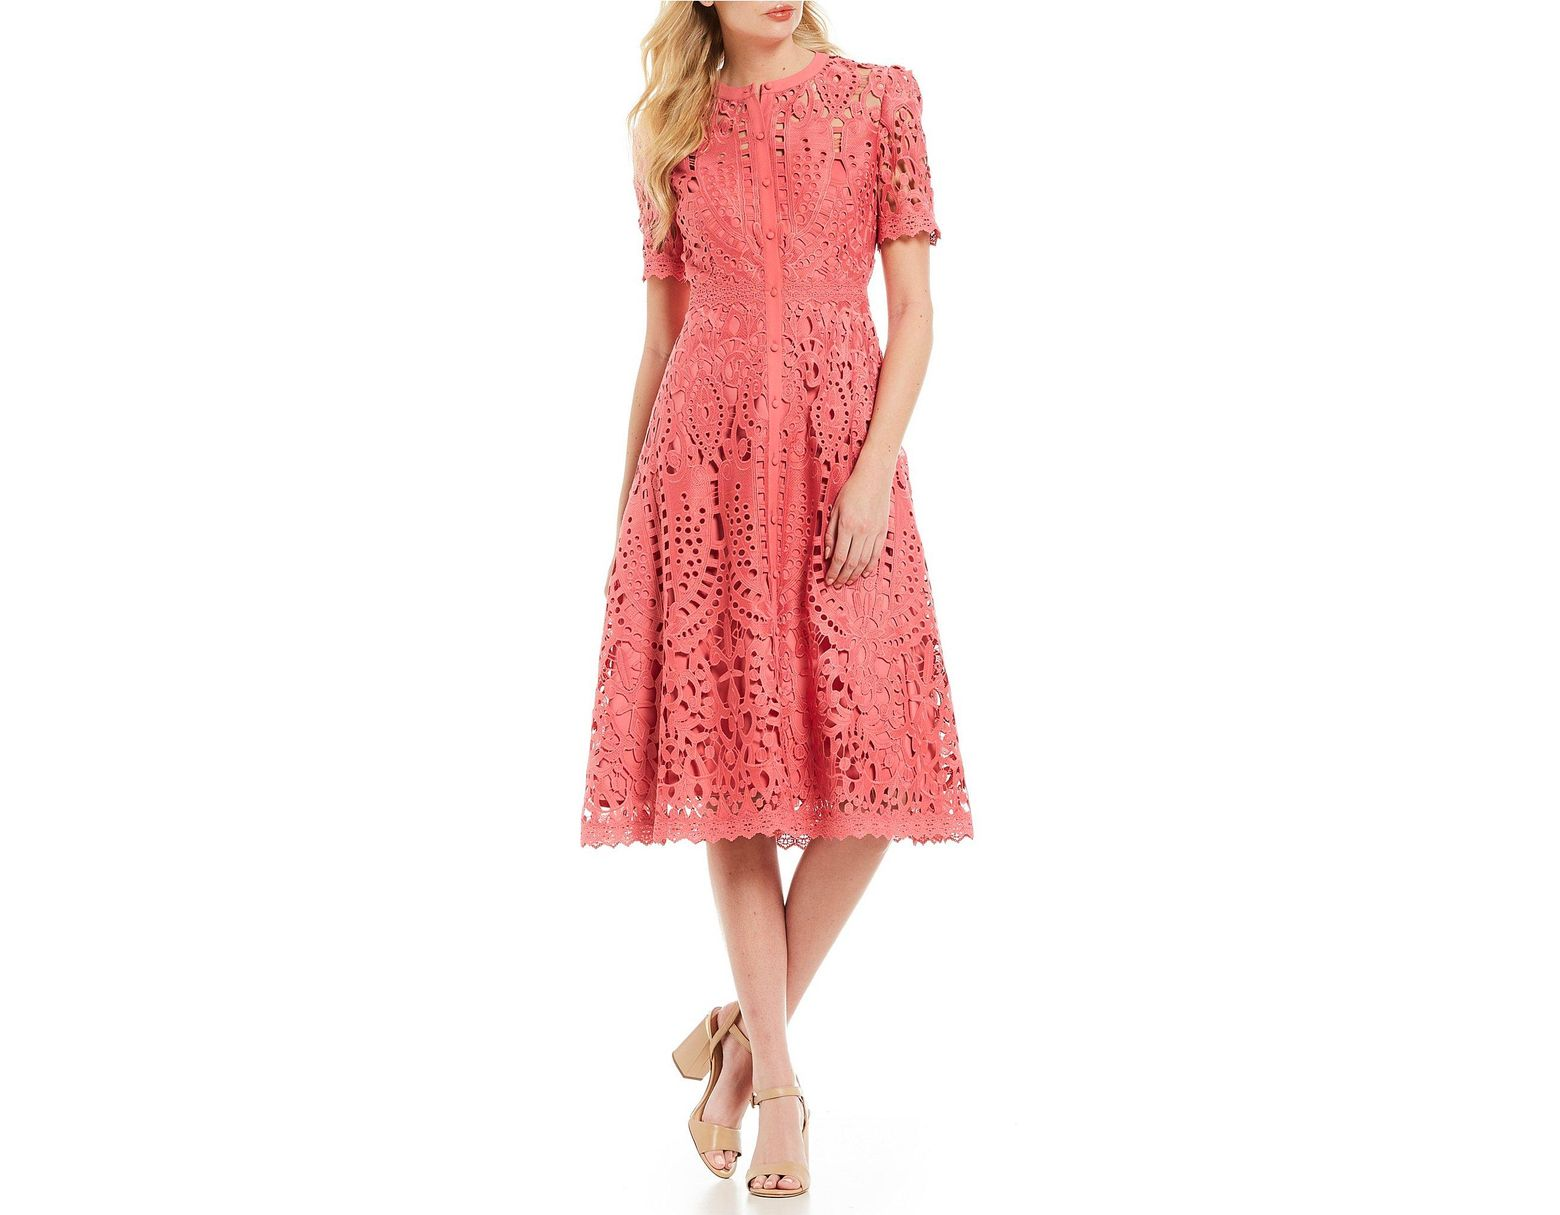 9bebd2216d2 Antonio Melani Ada High Neck Lace A-line Midi Dress in Pink - Lyst